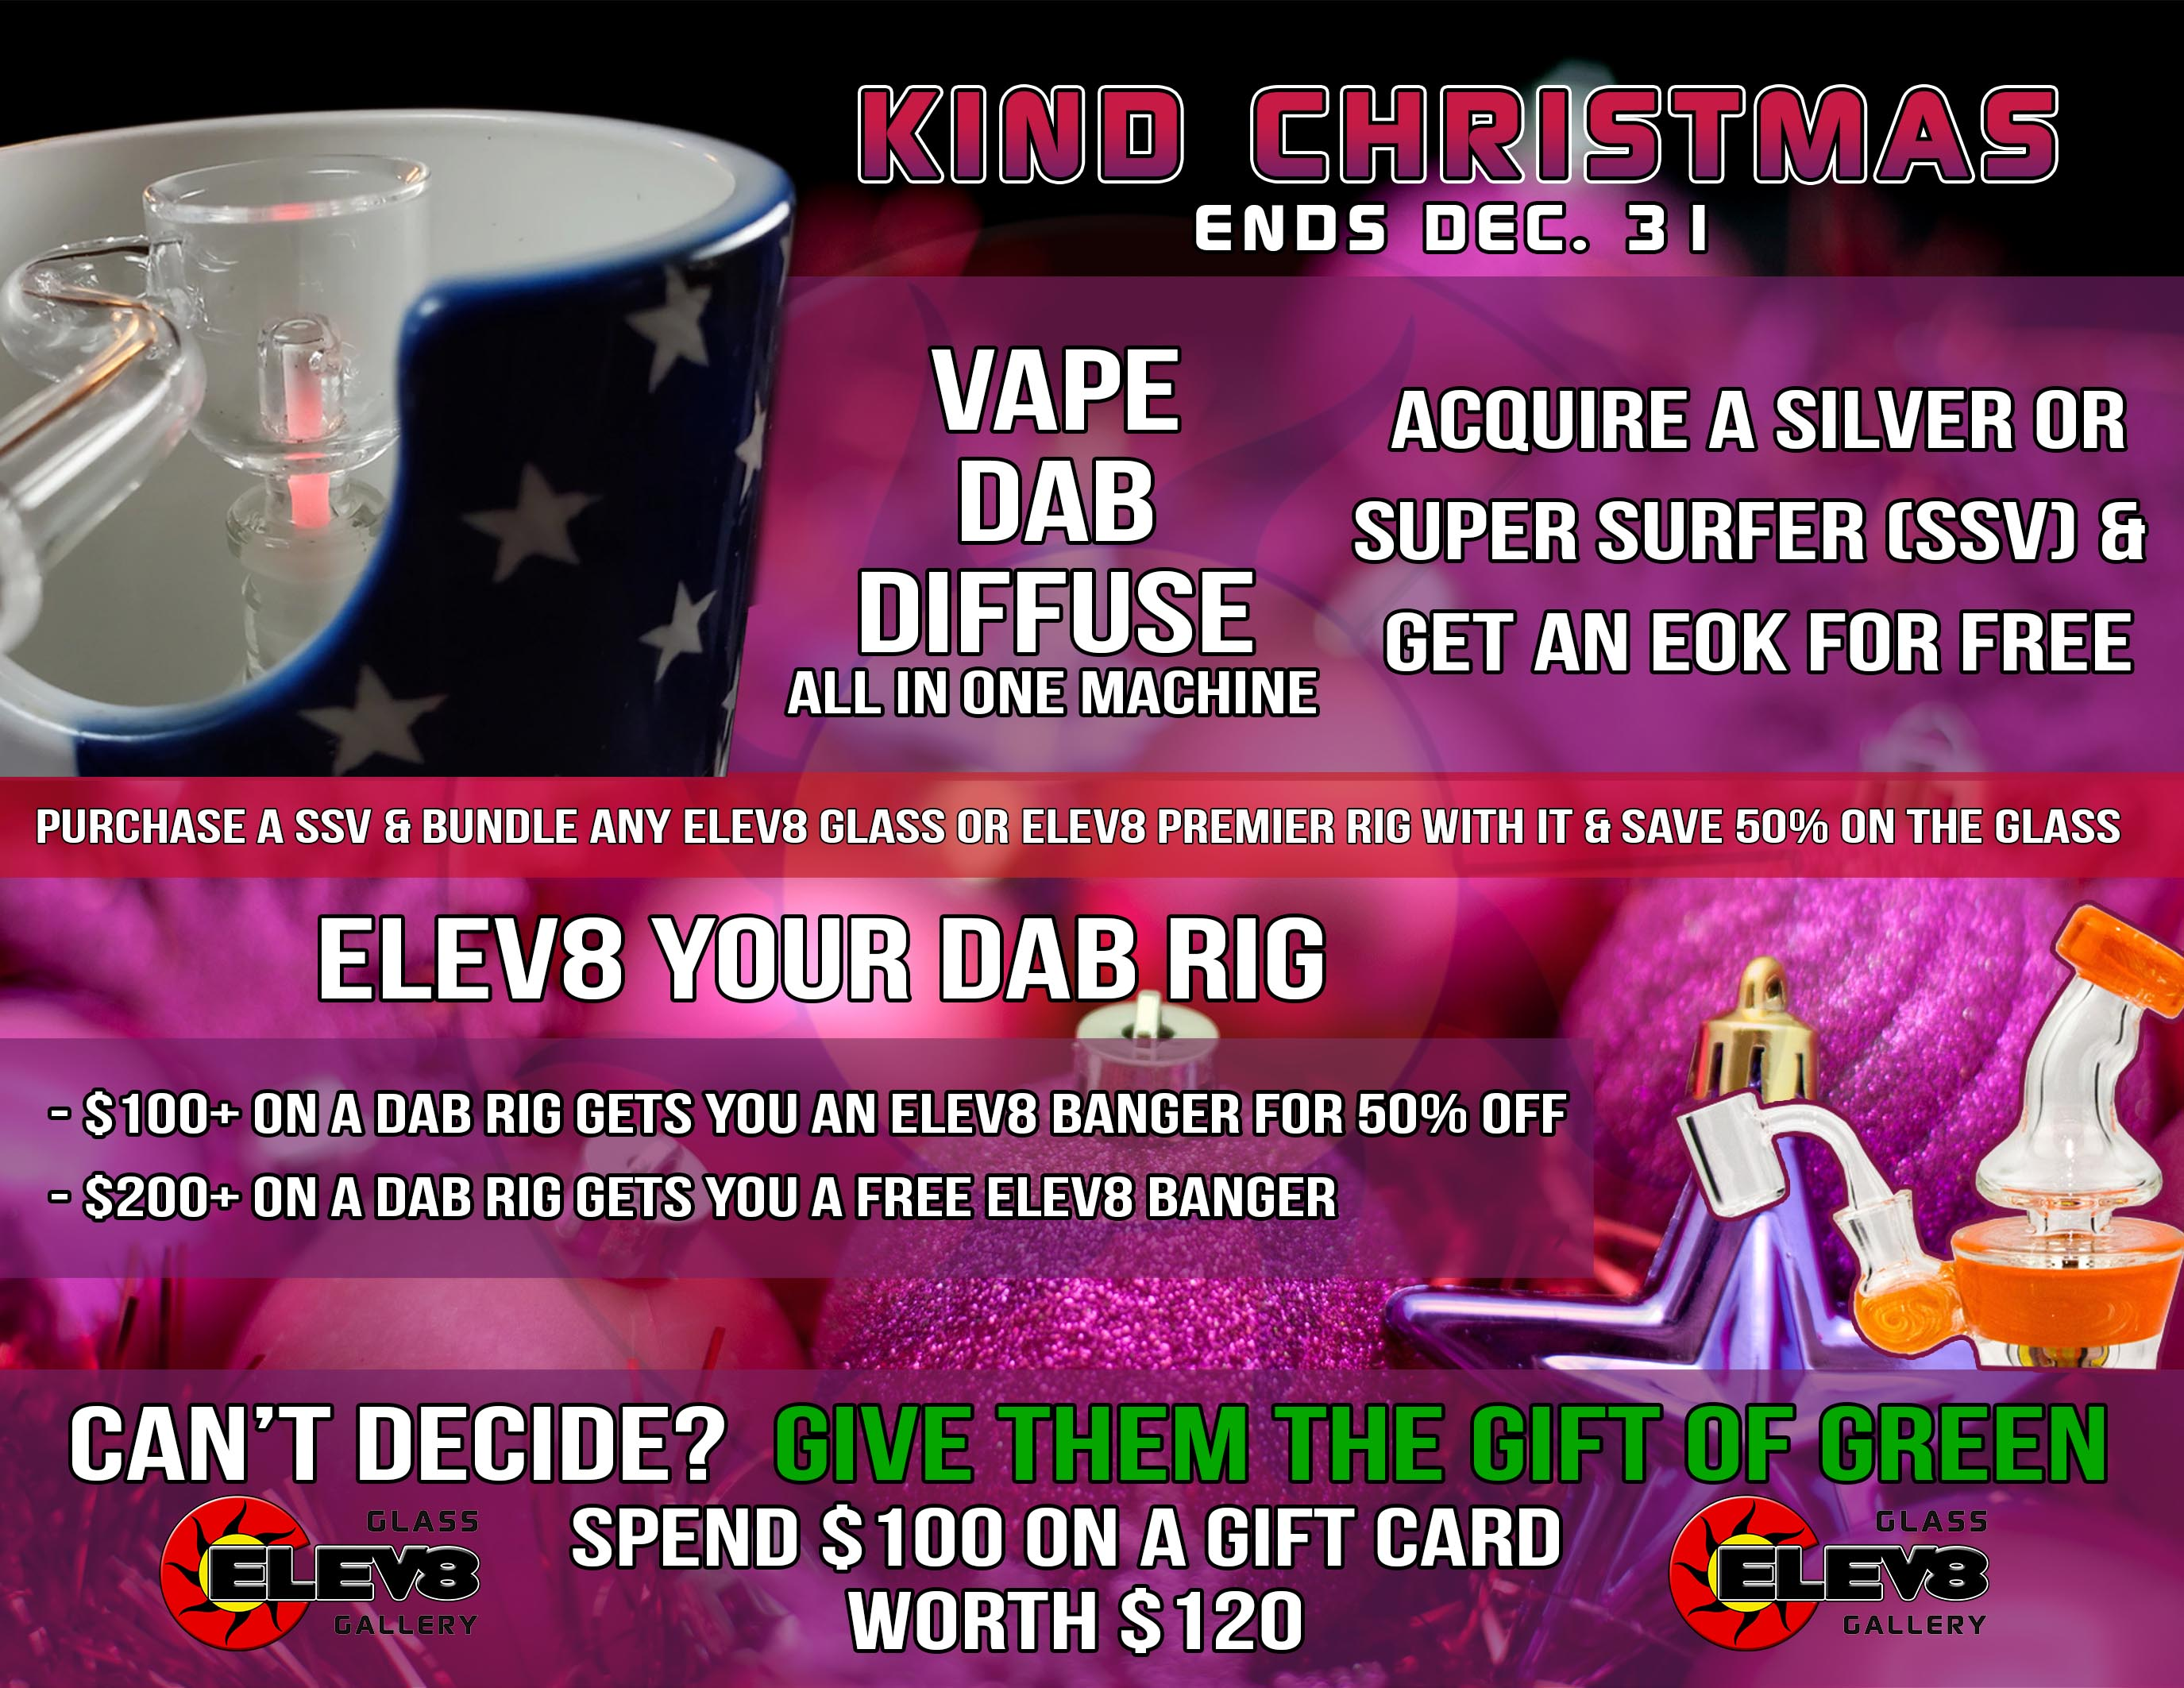 elev8-glass-gallery-christmas-sale.jpg